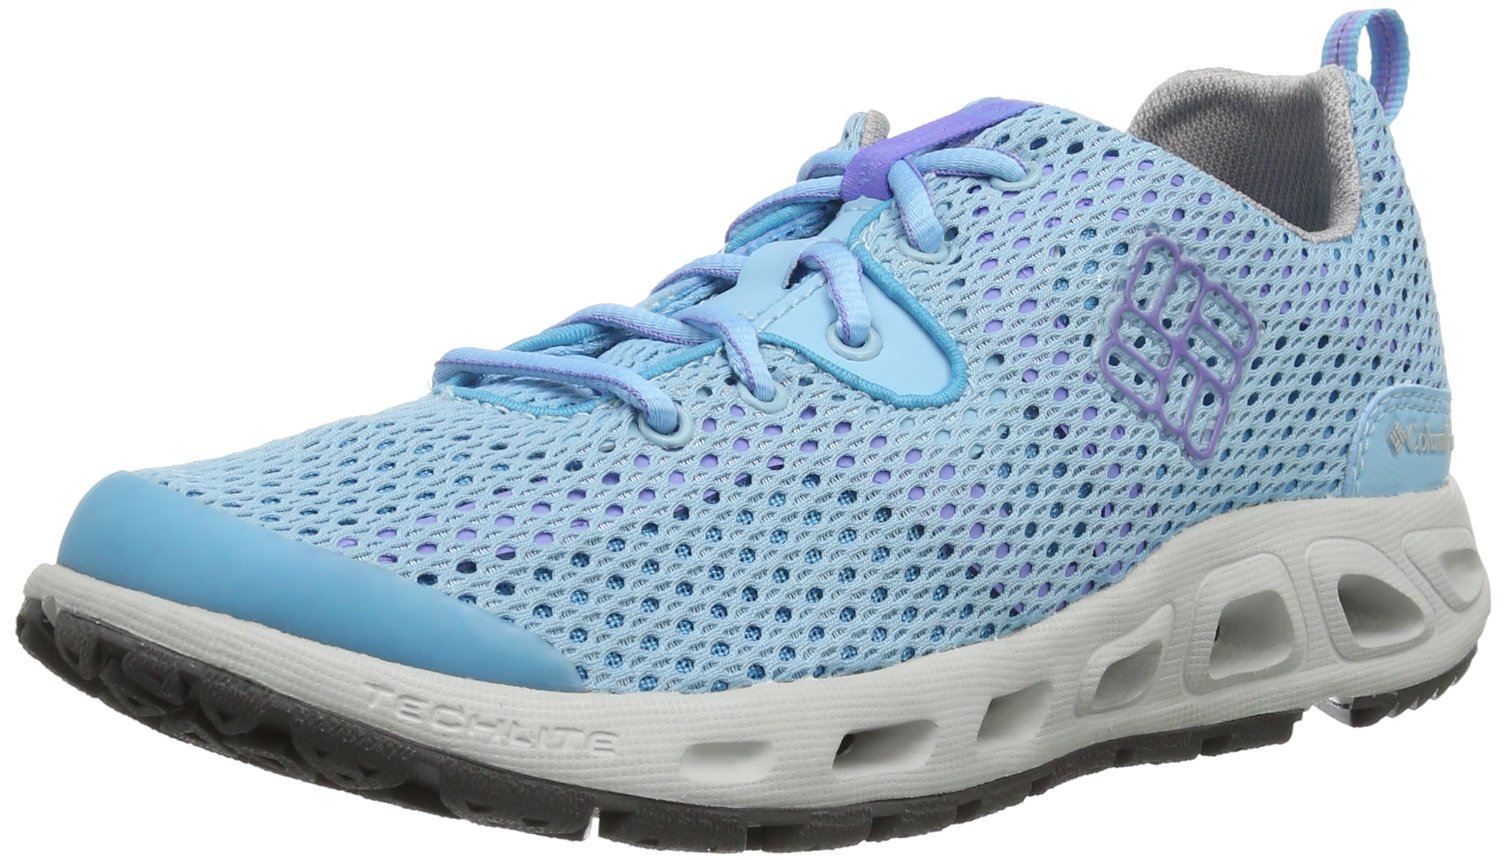 Columbia Women's Drainmaker II Water Shoe,Air Stream/Fairytale,7 M US